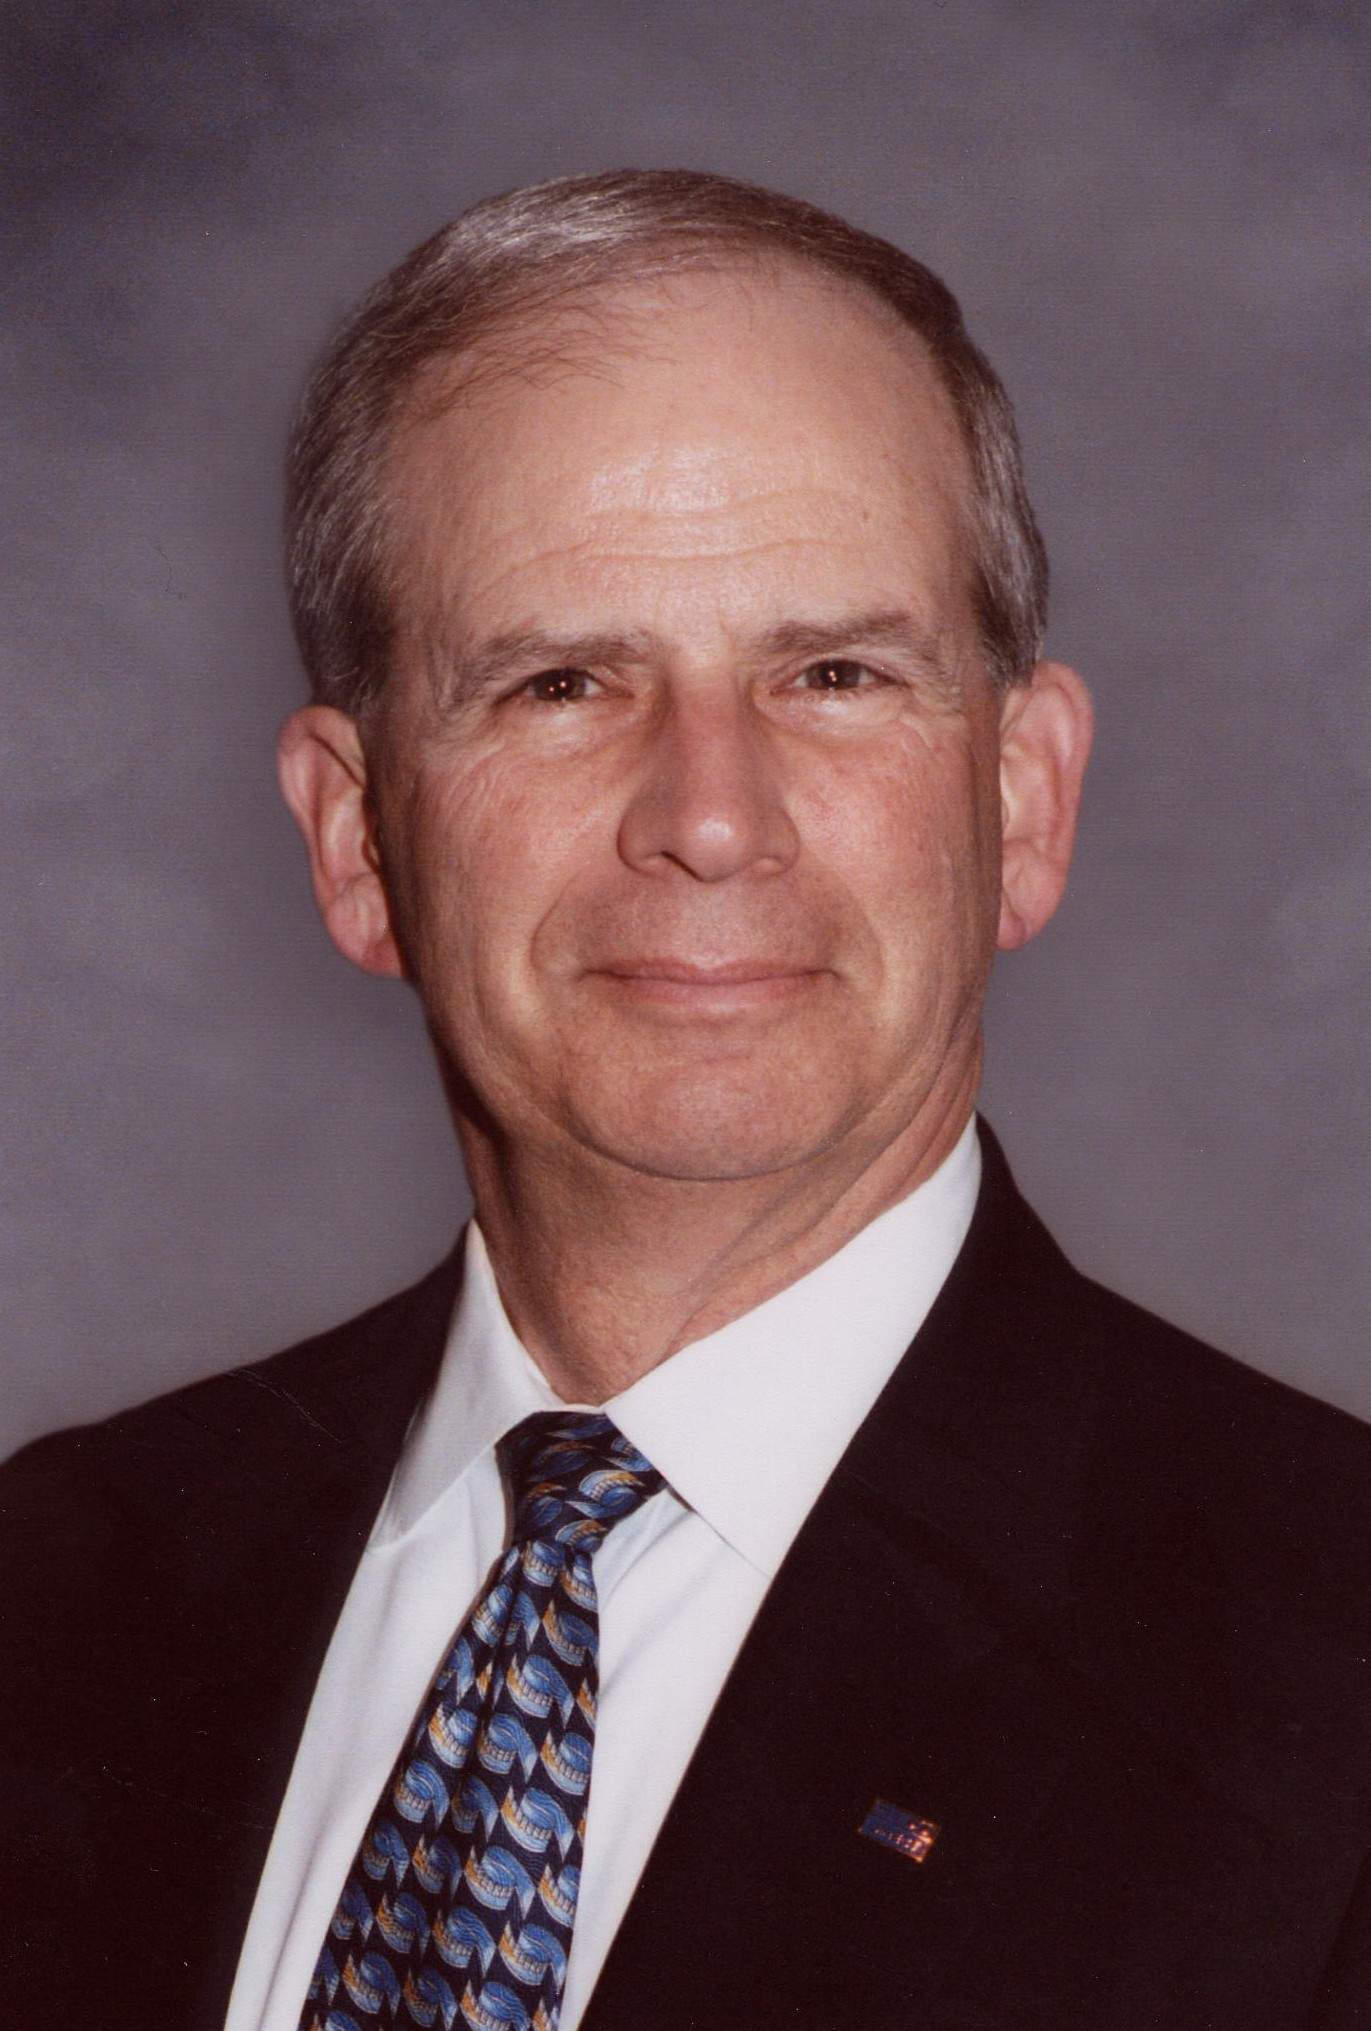 Robert Miller head shot (Photo: Business Wire)